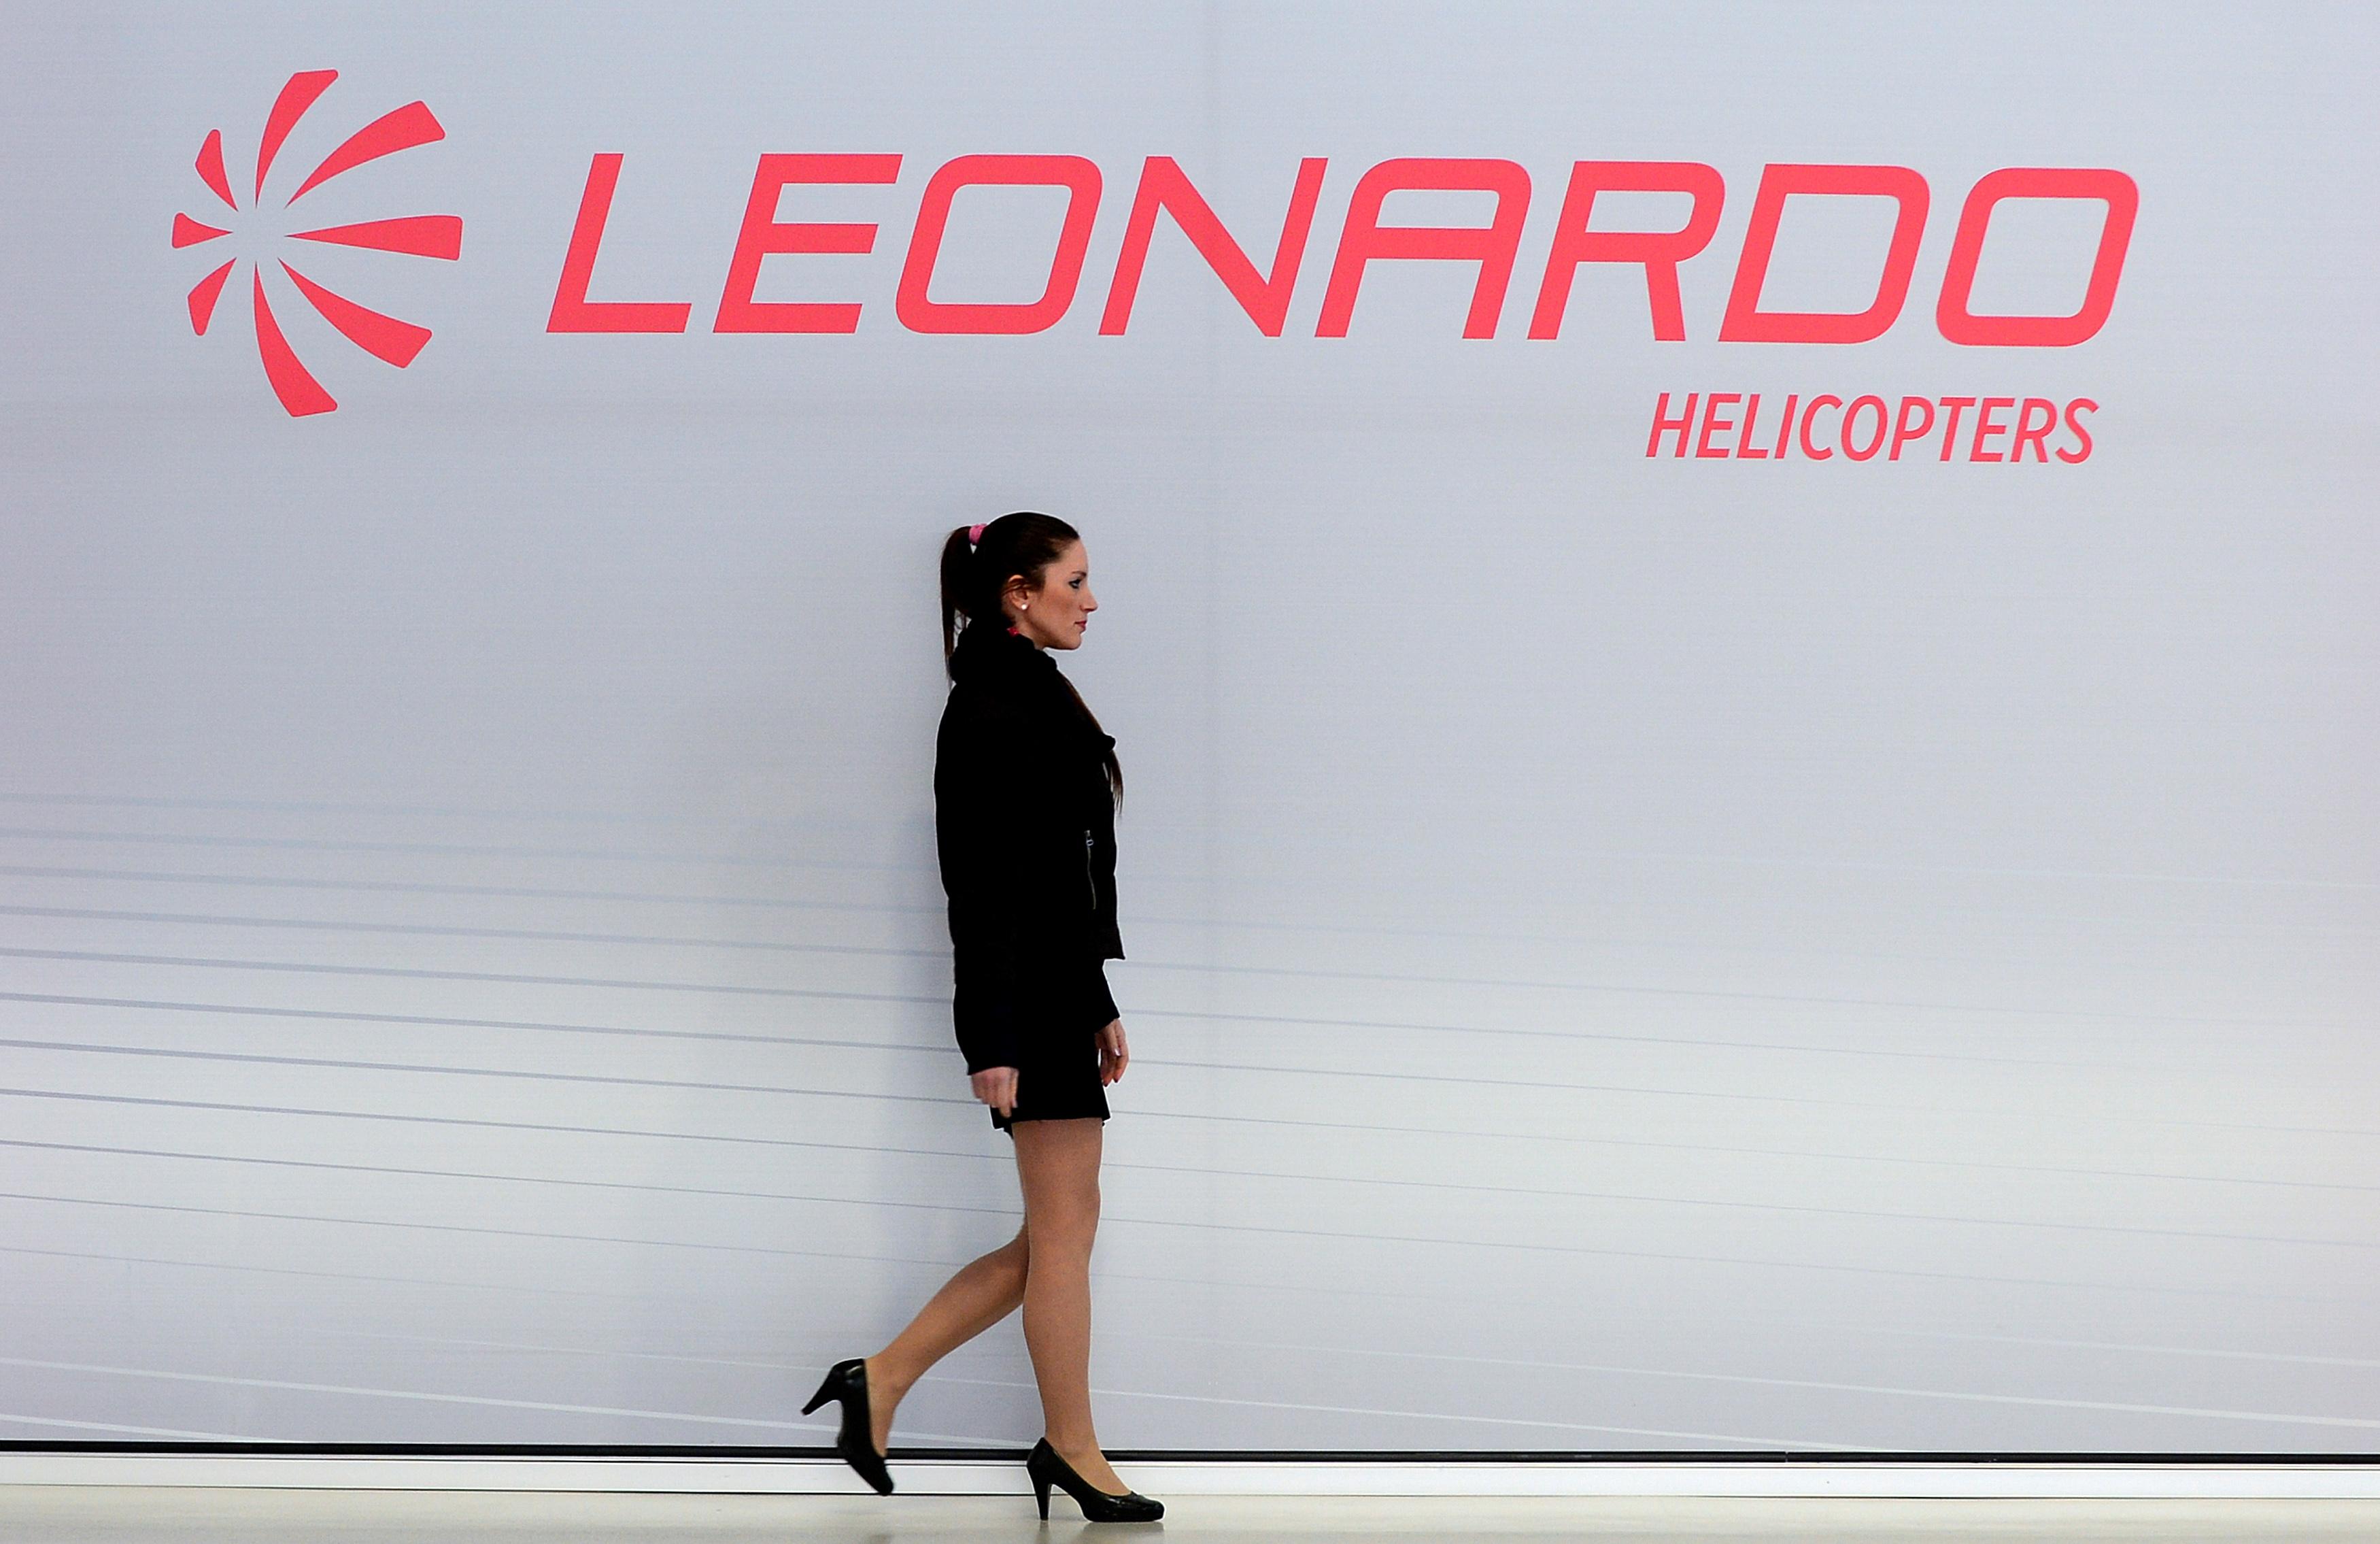 A hostess walks past a Leonardo's helicopter logo at the headquarters in Vergiate, near Milan, Italy, January 30, 2018. REUTERS/Massimo Pinca